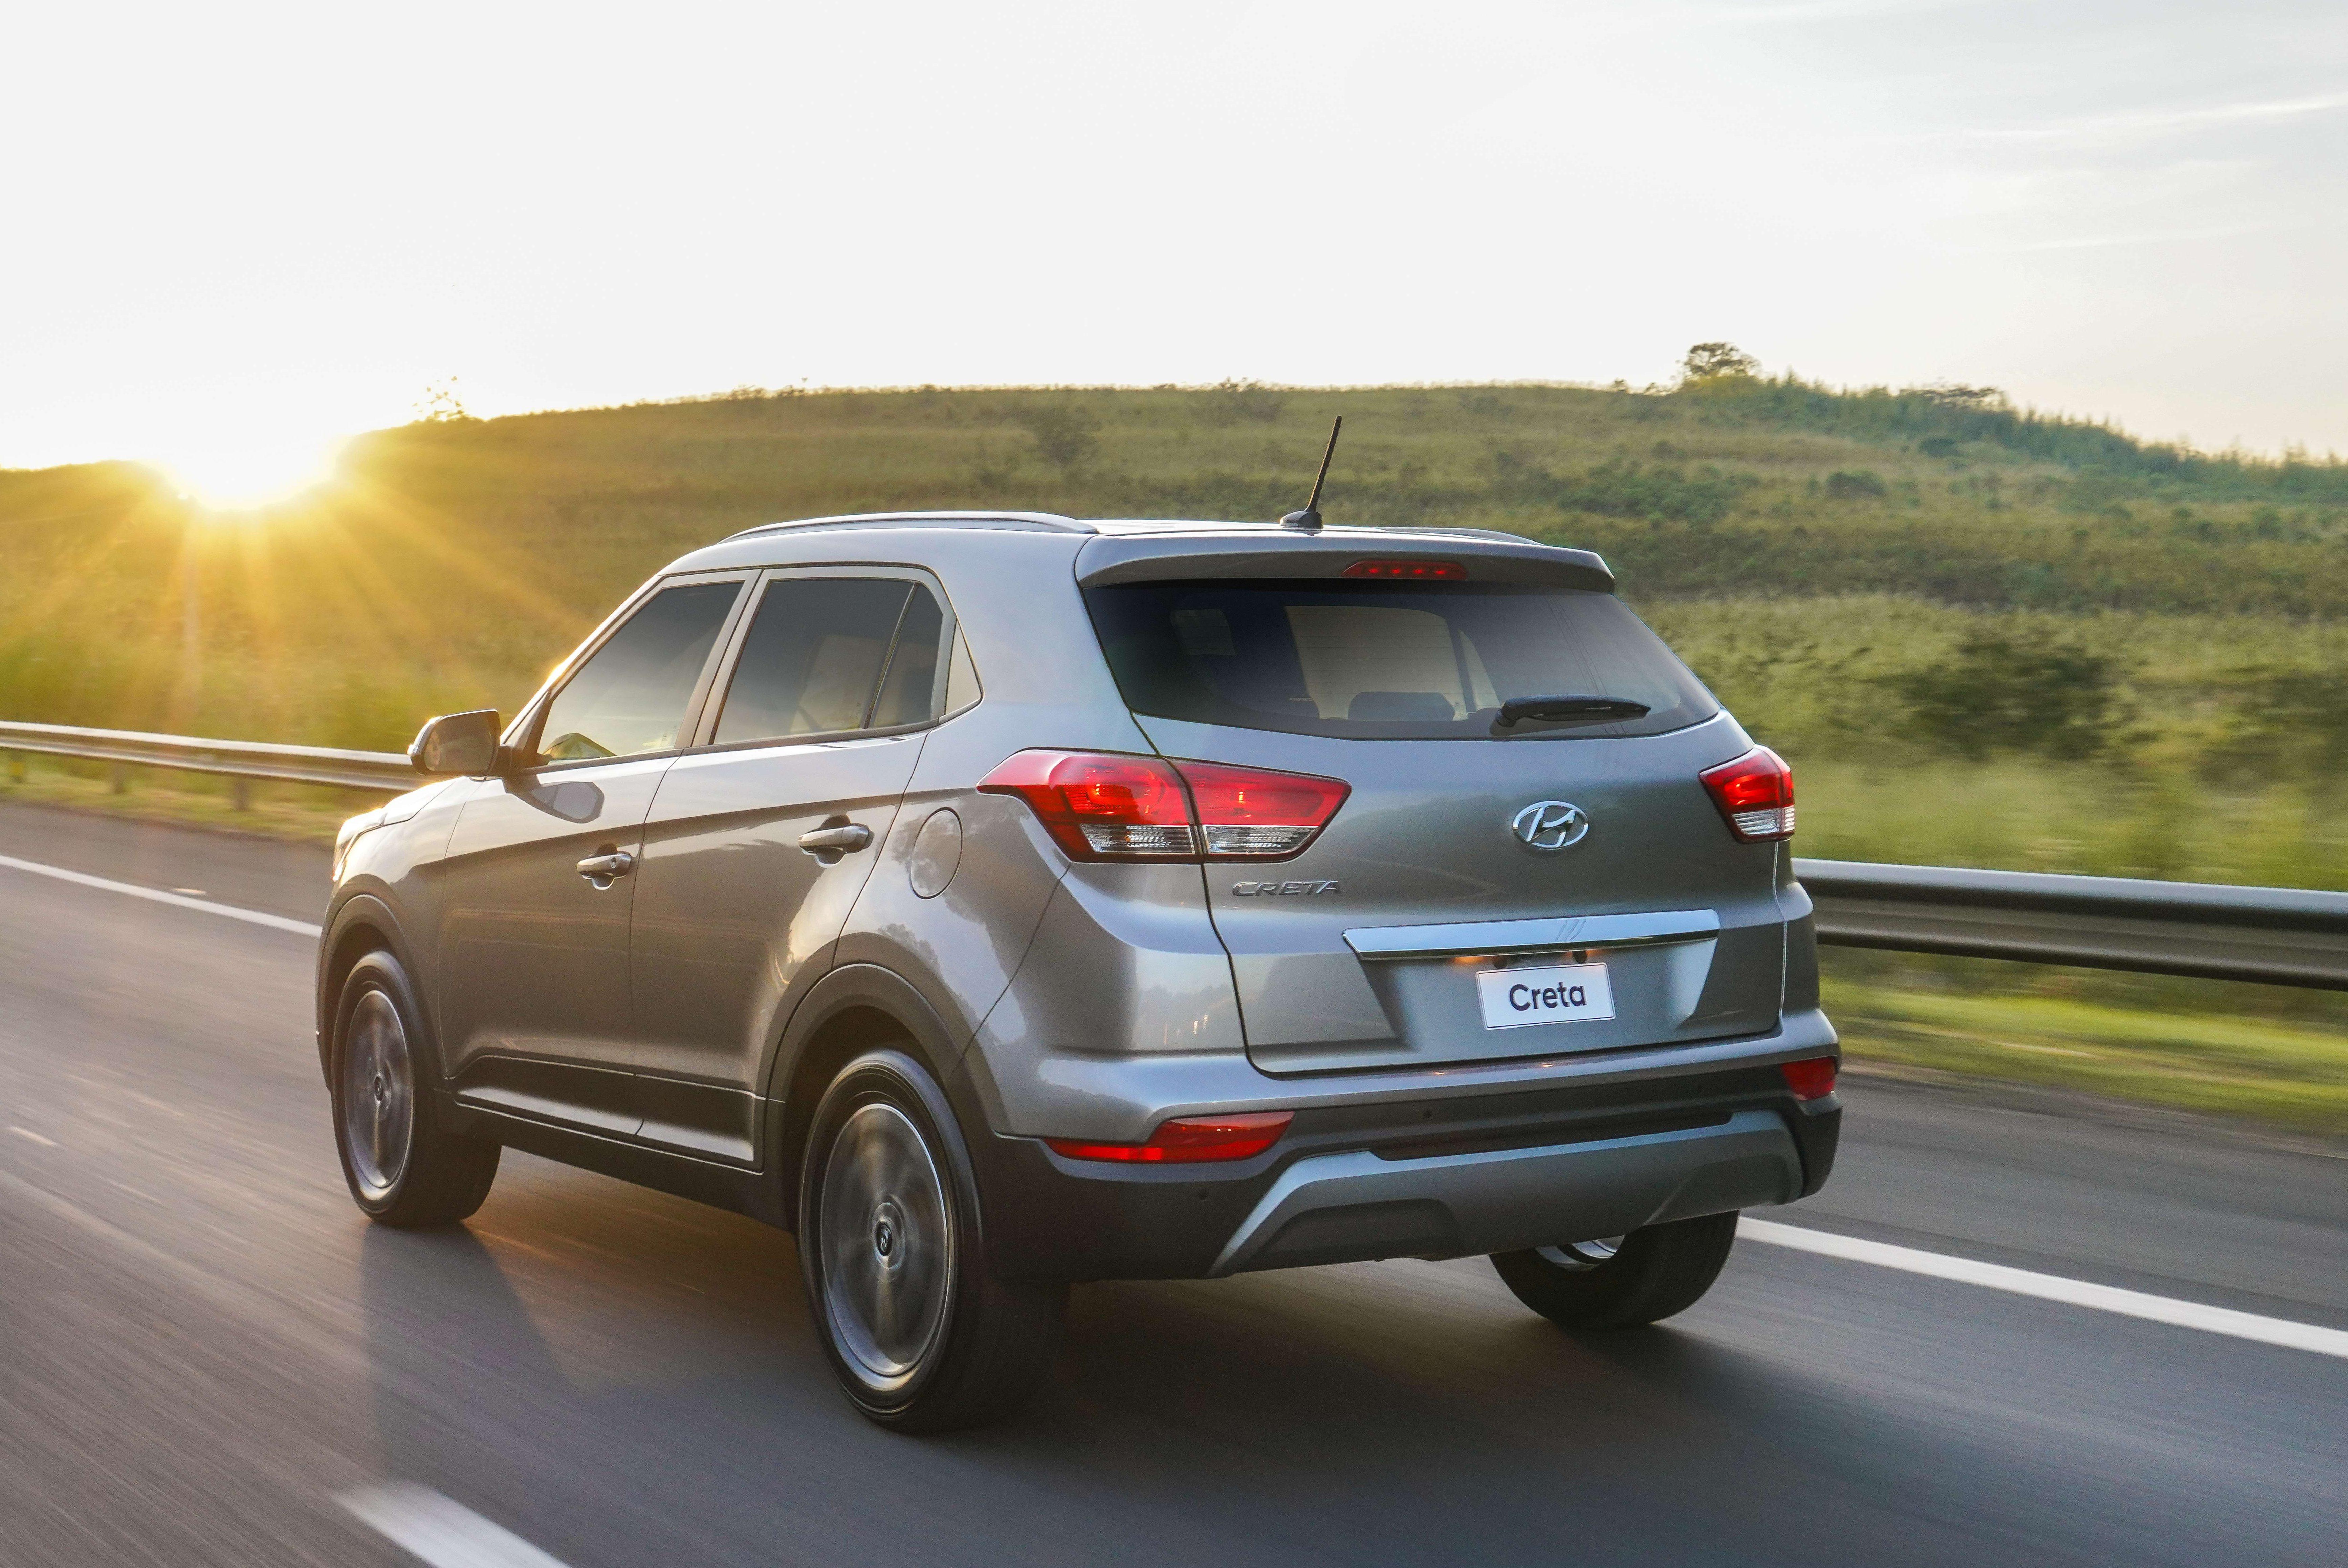 Hyundai-Creta-Smart-Plus-1.6-AT_9-e1597248422705.jpg